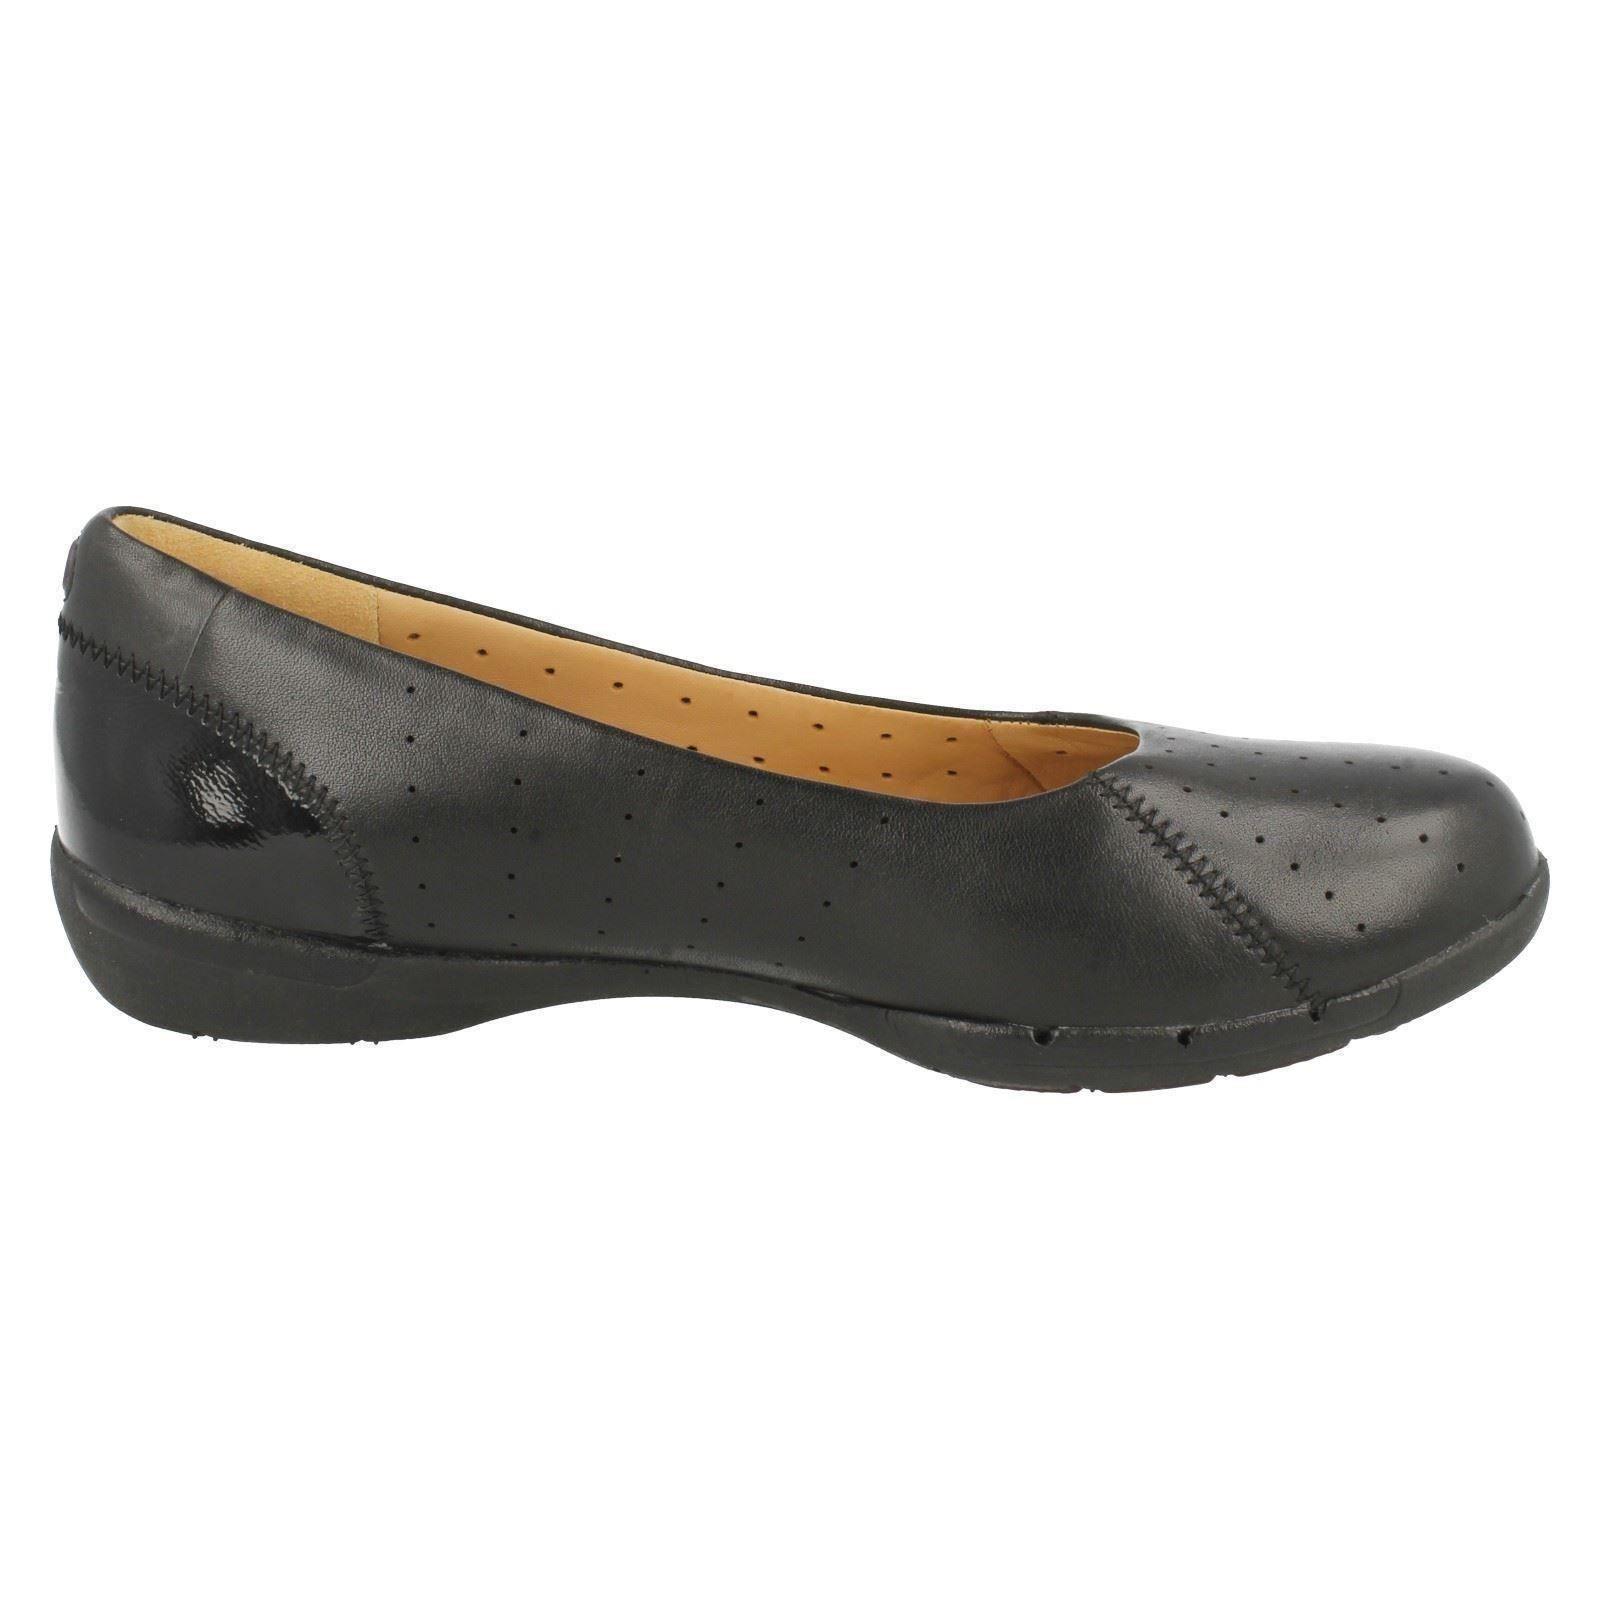 Clarks Ladies Unstructured Flat Shoes Un Hearth | EBay